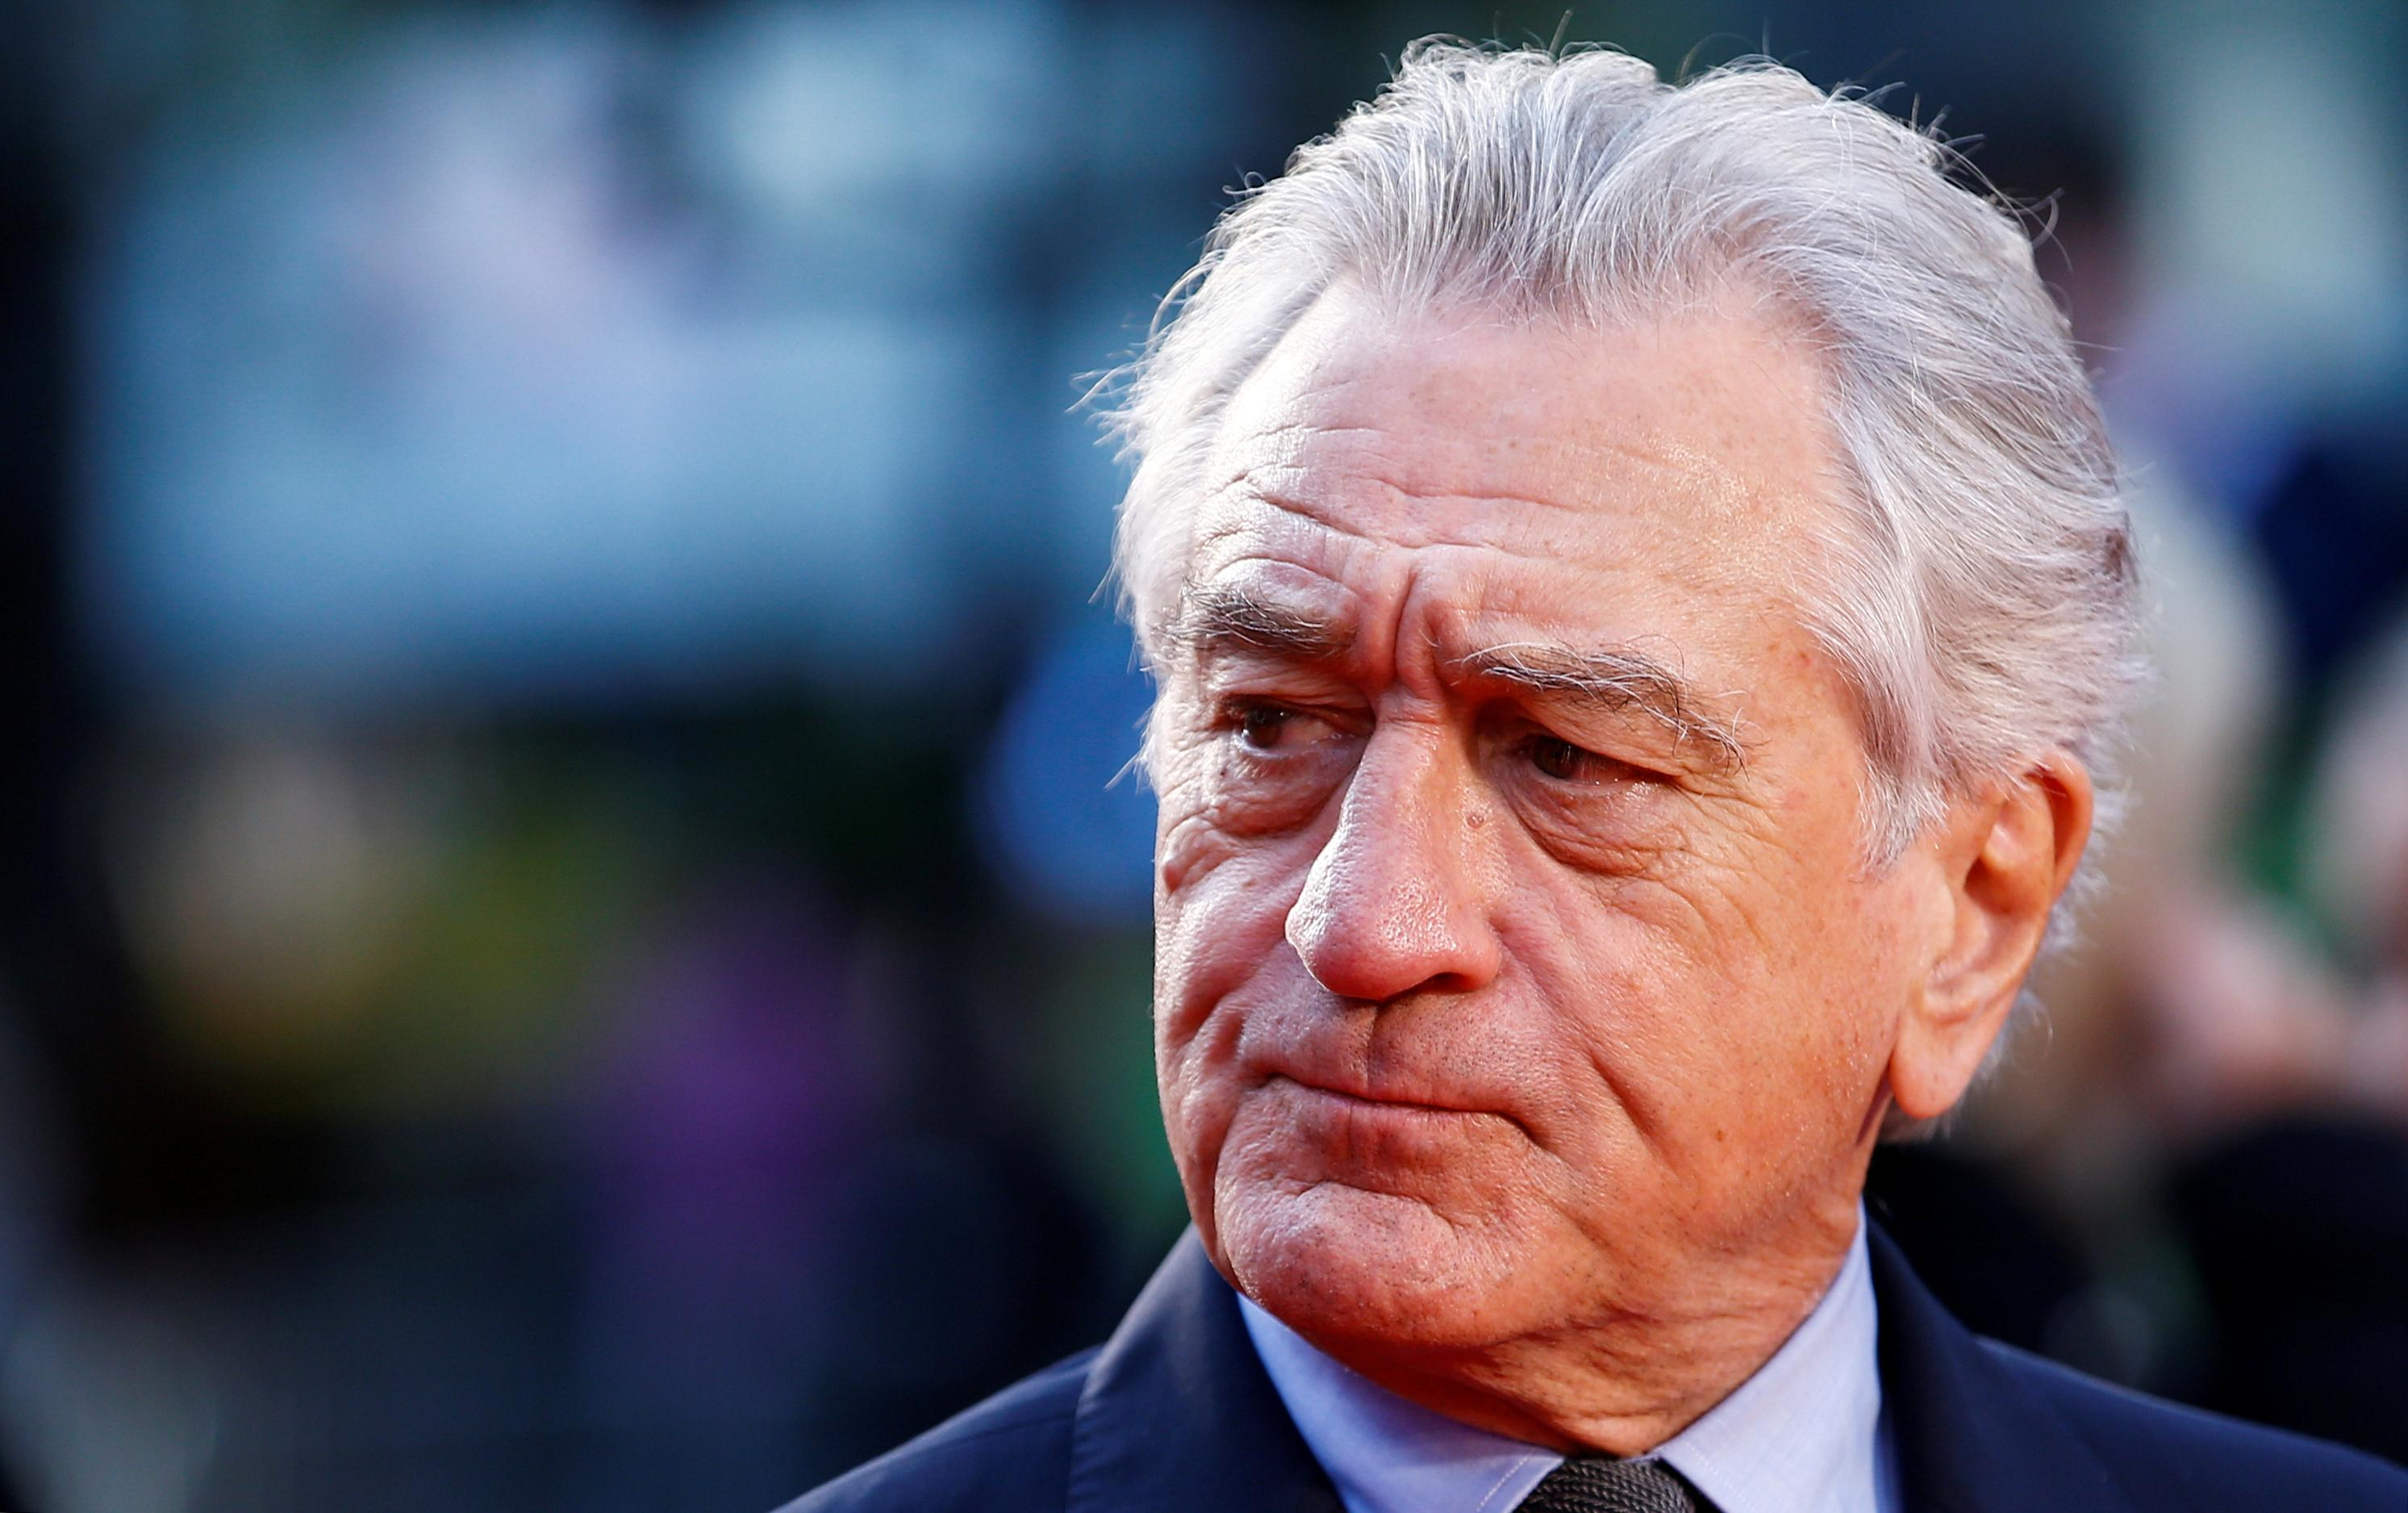 Robert De Niro to get lifetime achievement award from actor union